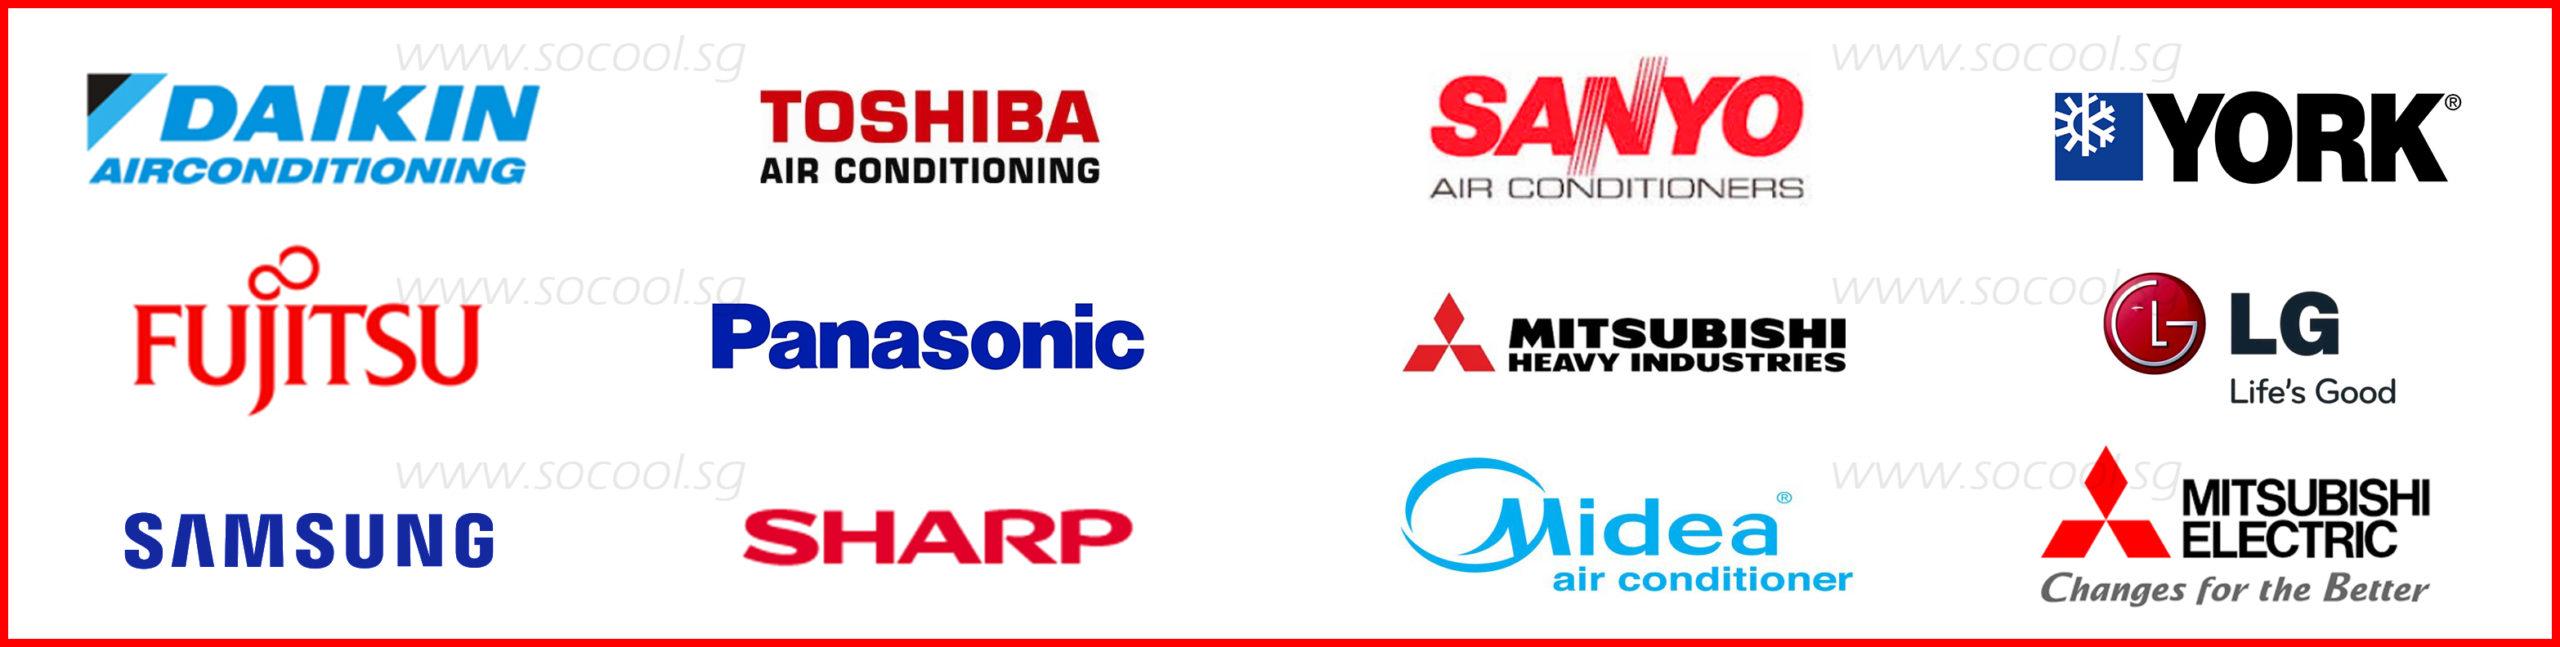 aircon brand